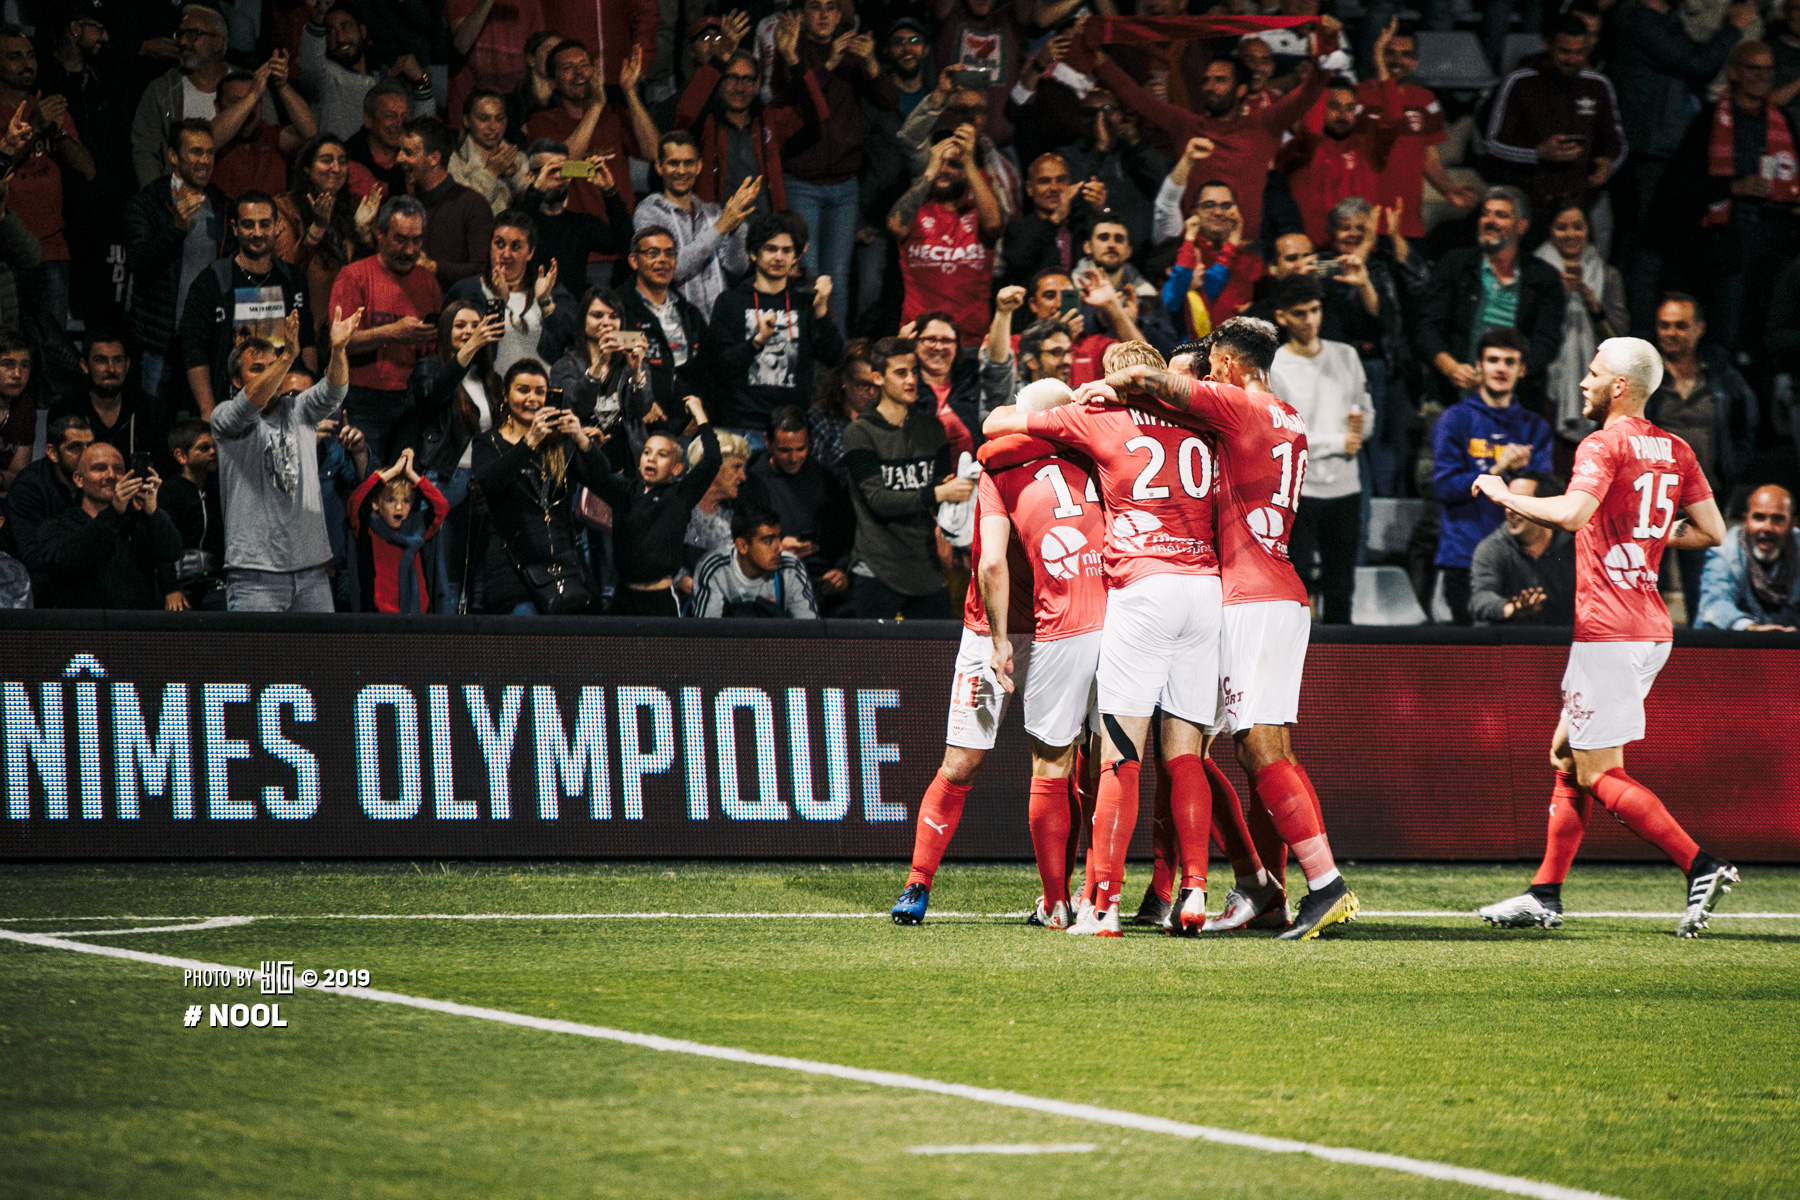 Nîmes Olympique -Olympique Lyonnais - 24 MAI 2019STADE DES COSTIERES, NÎMES145 PHOTOS